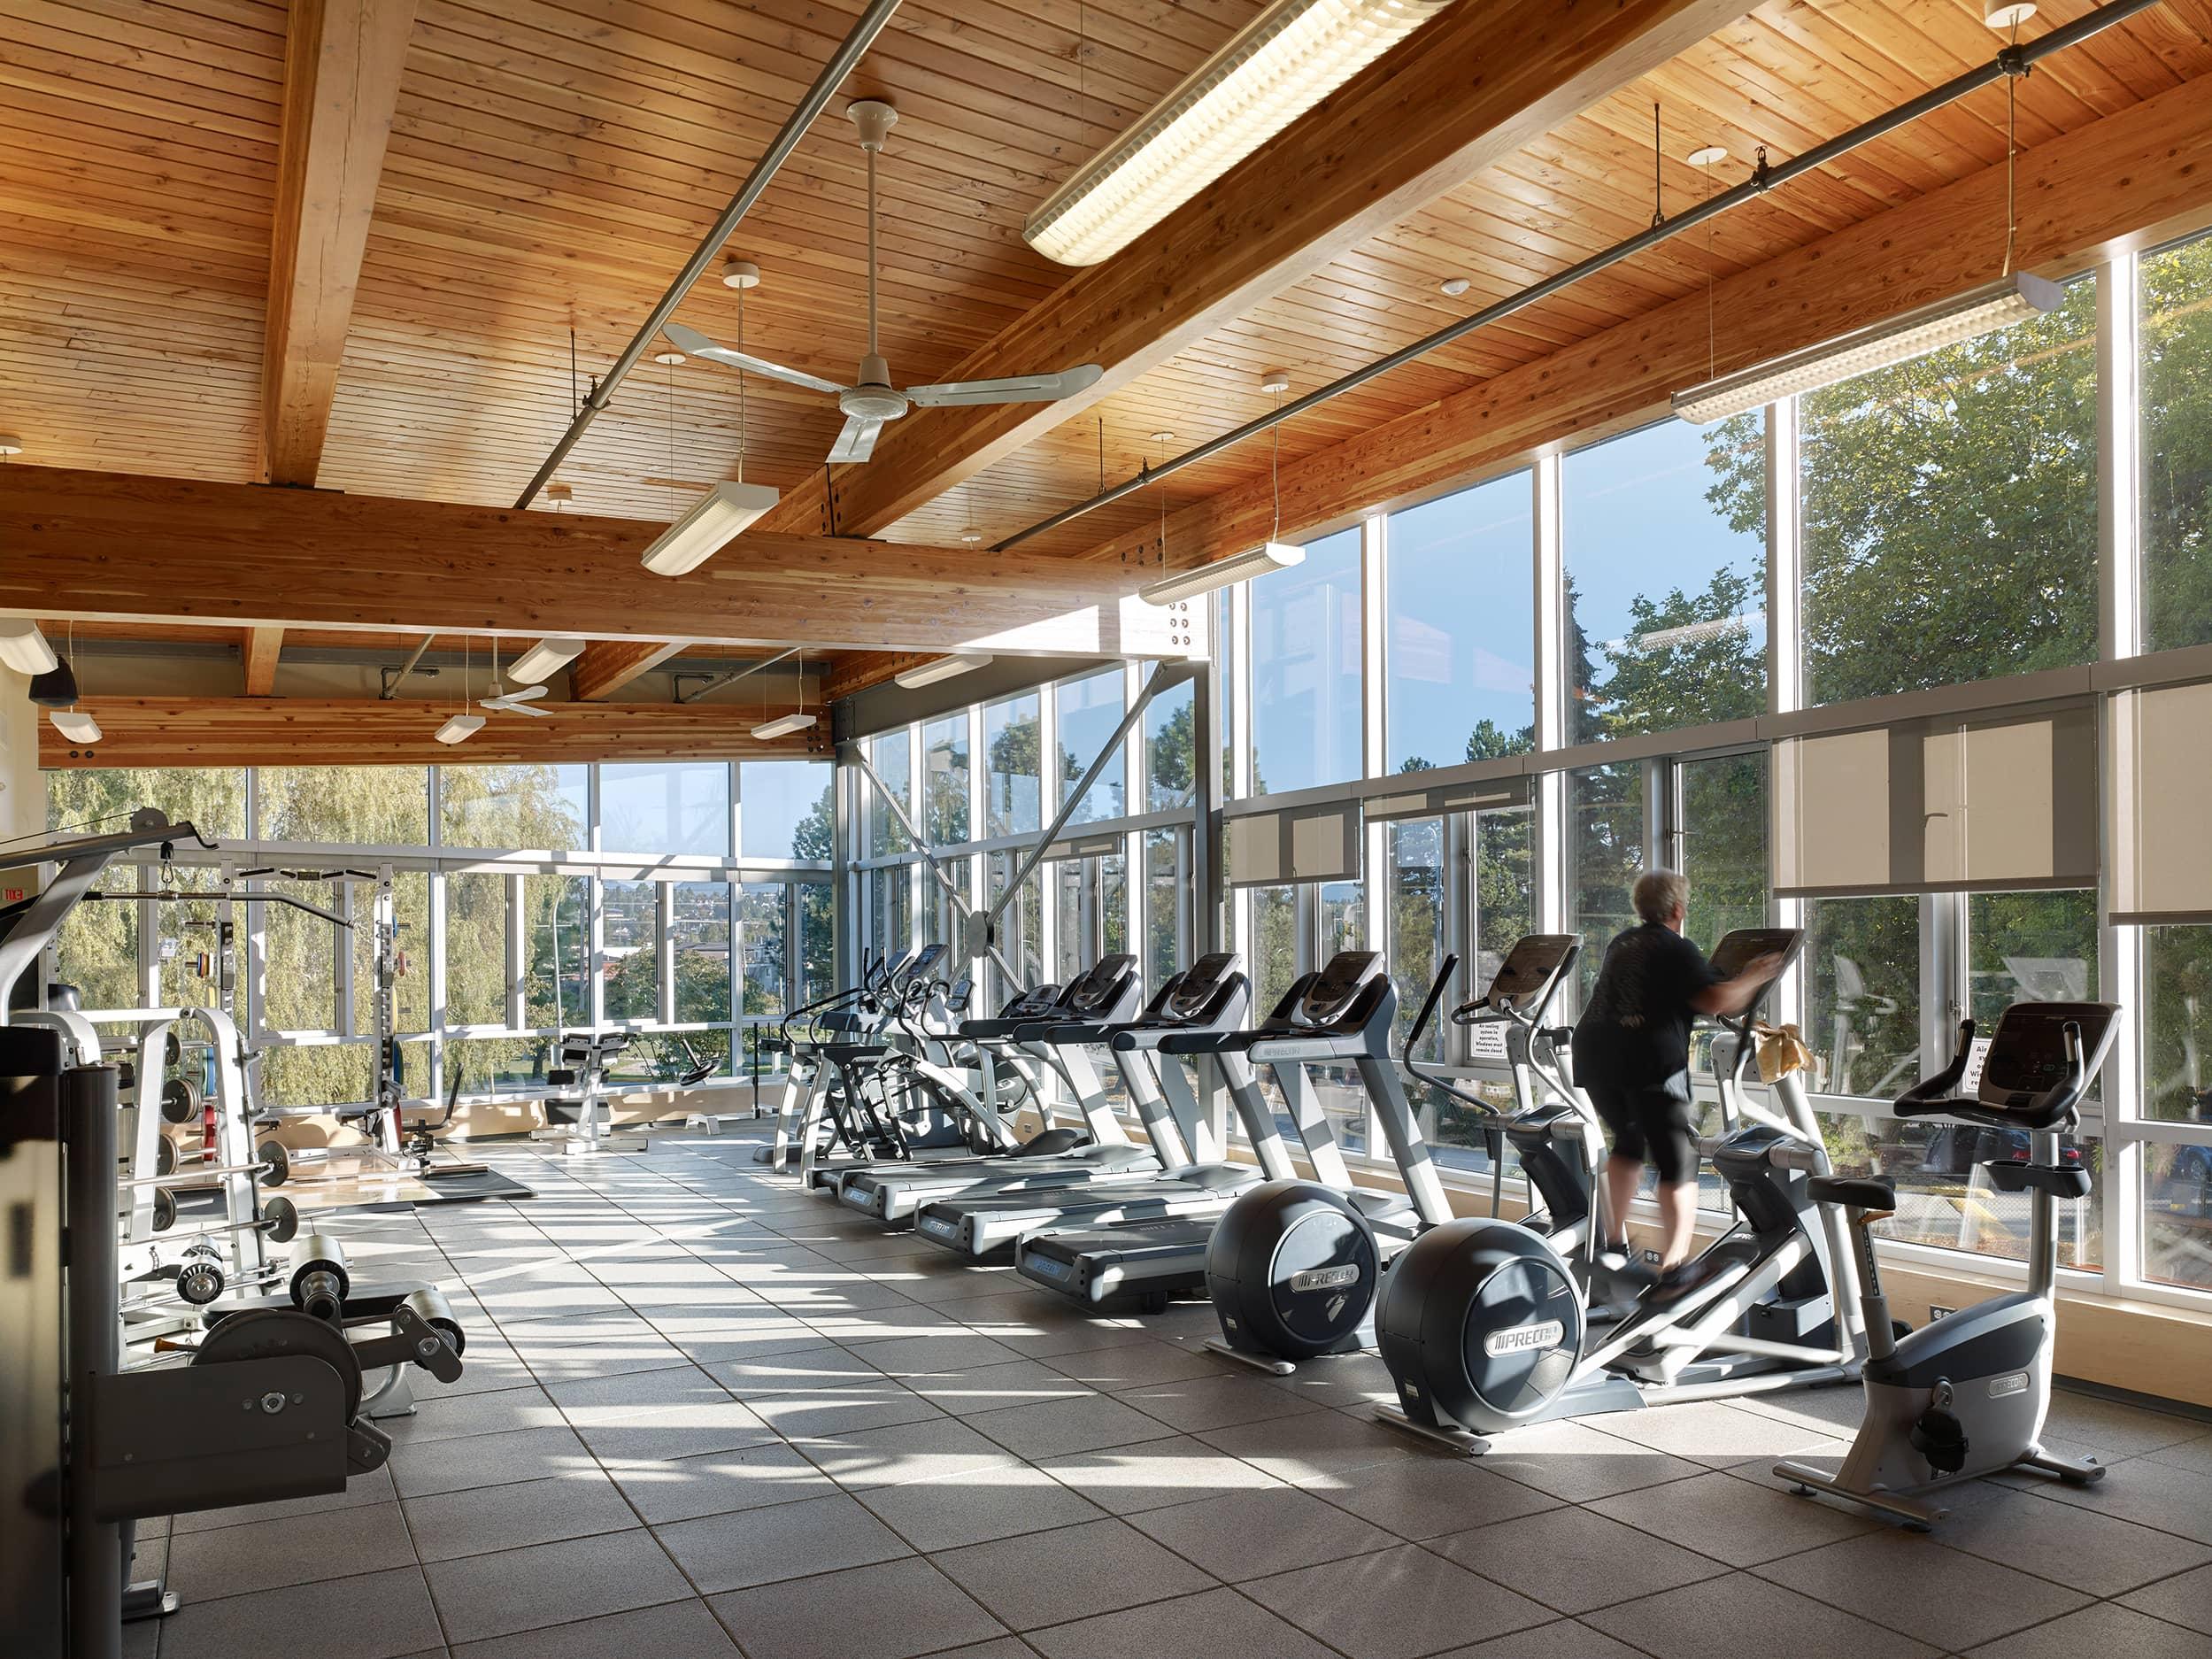 bbp queensborough community centre gym